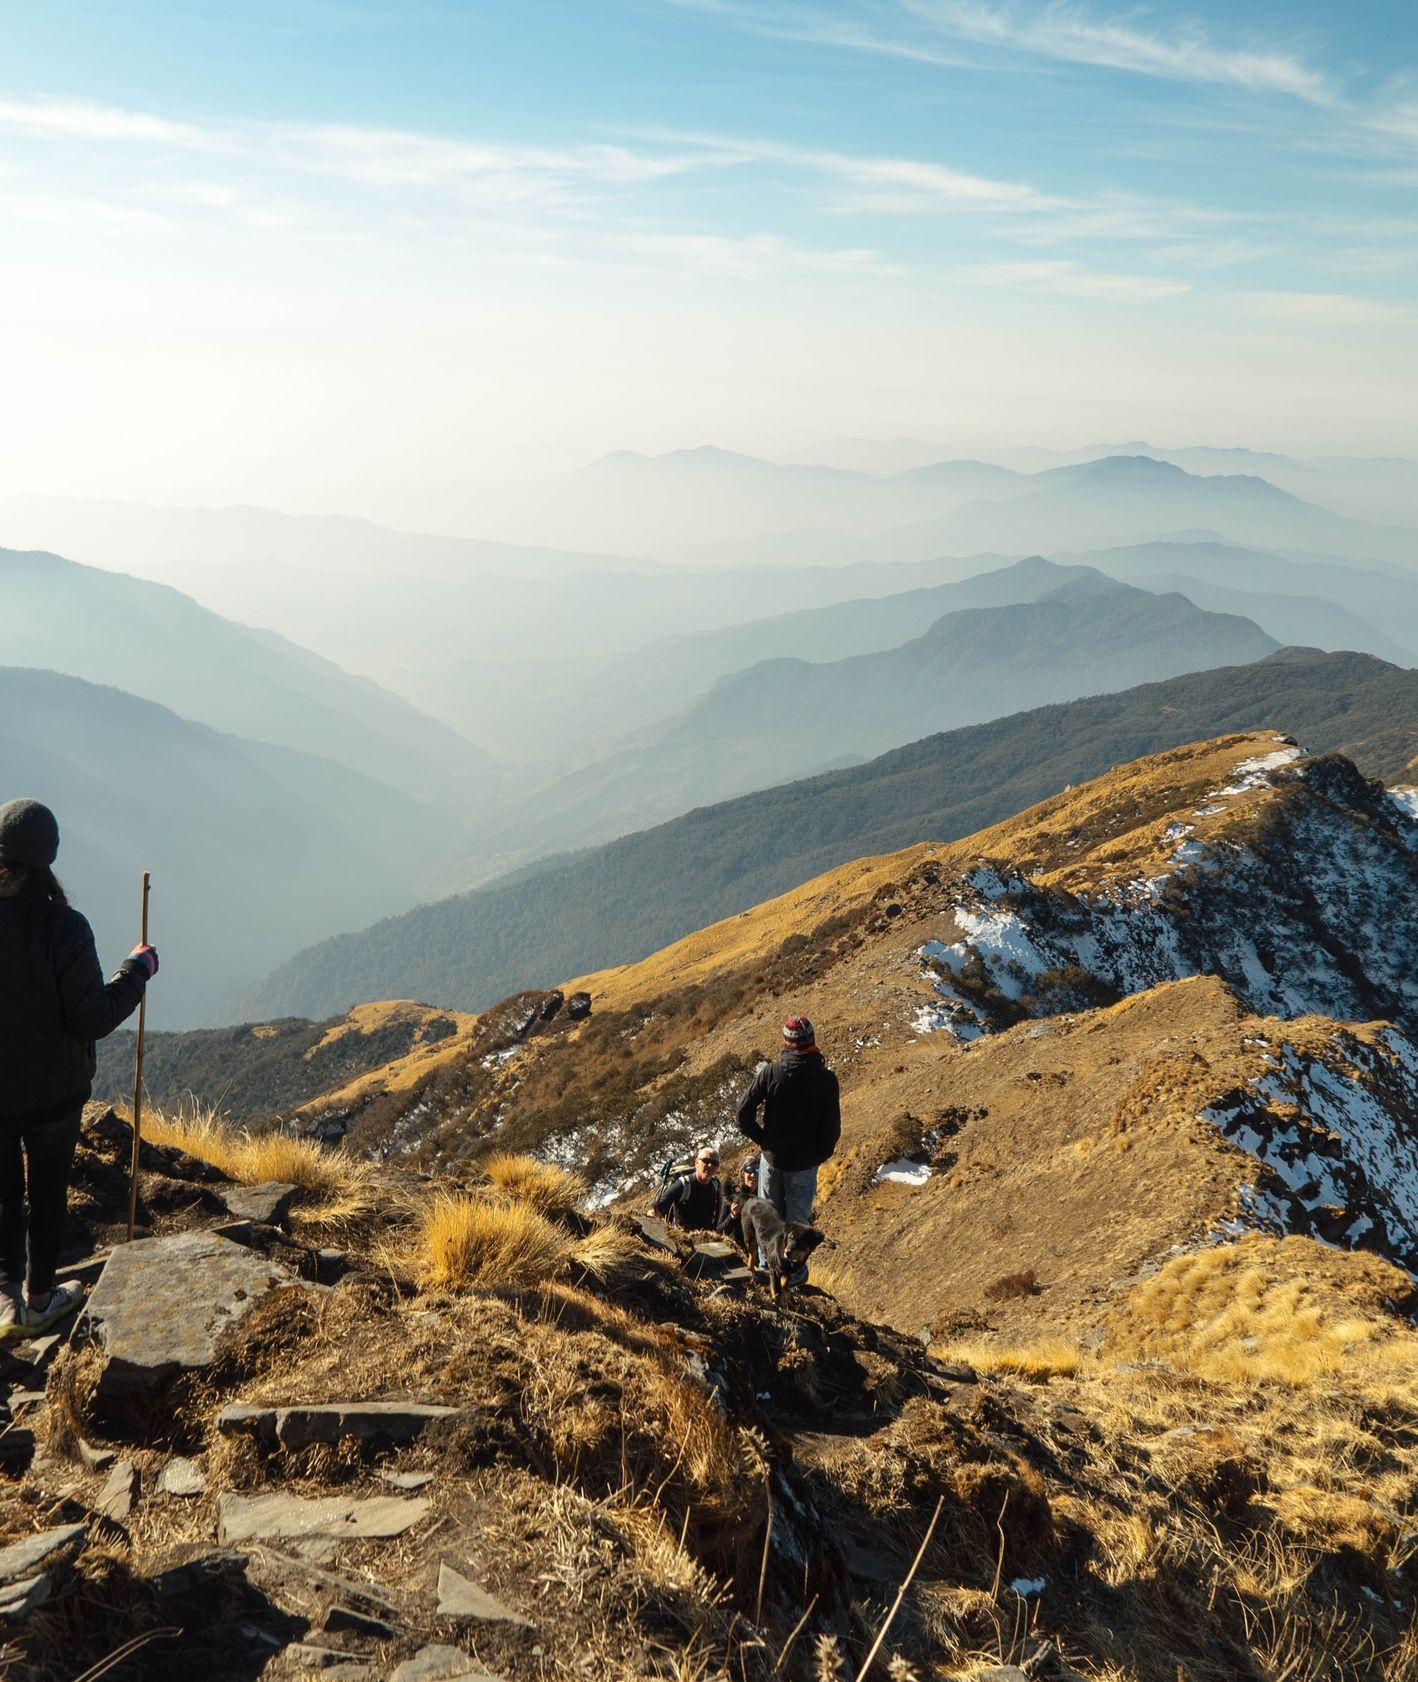 Podróżnicy w górach (fot. Galen Crout / unsplash.com)